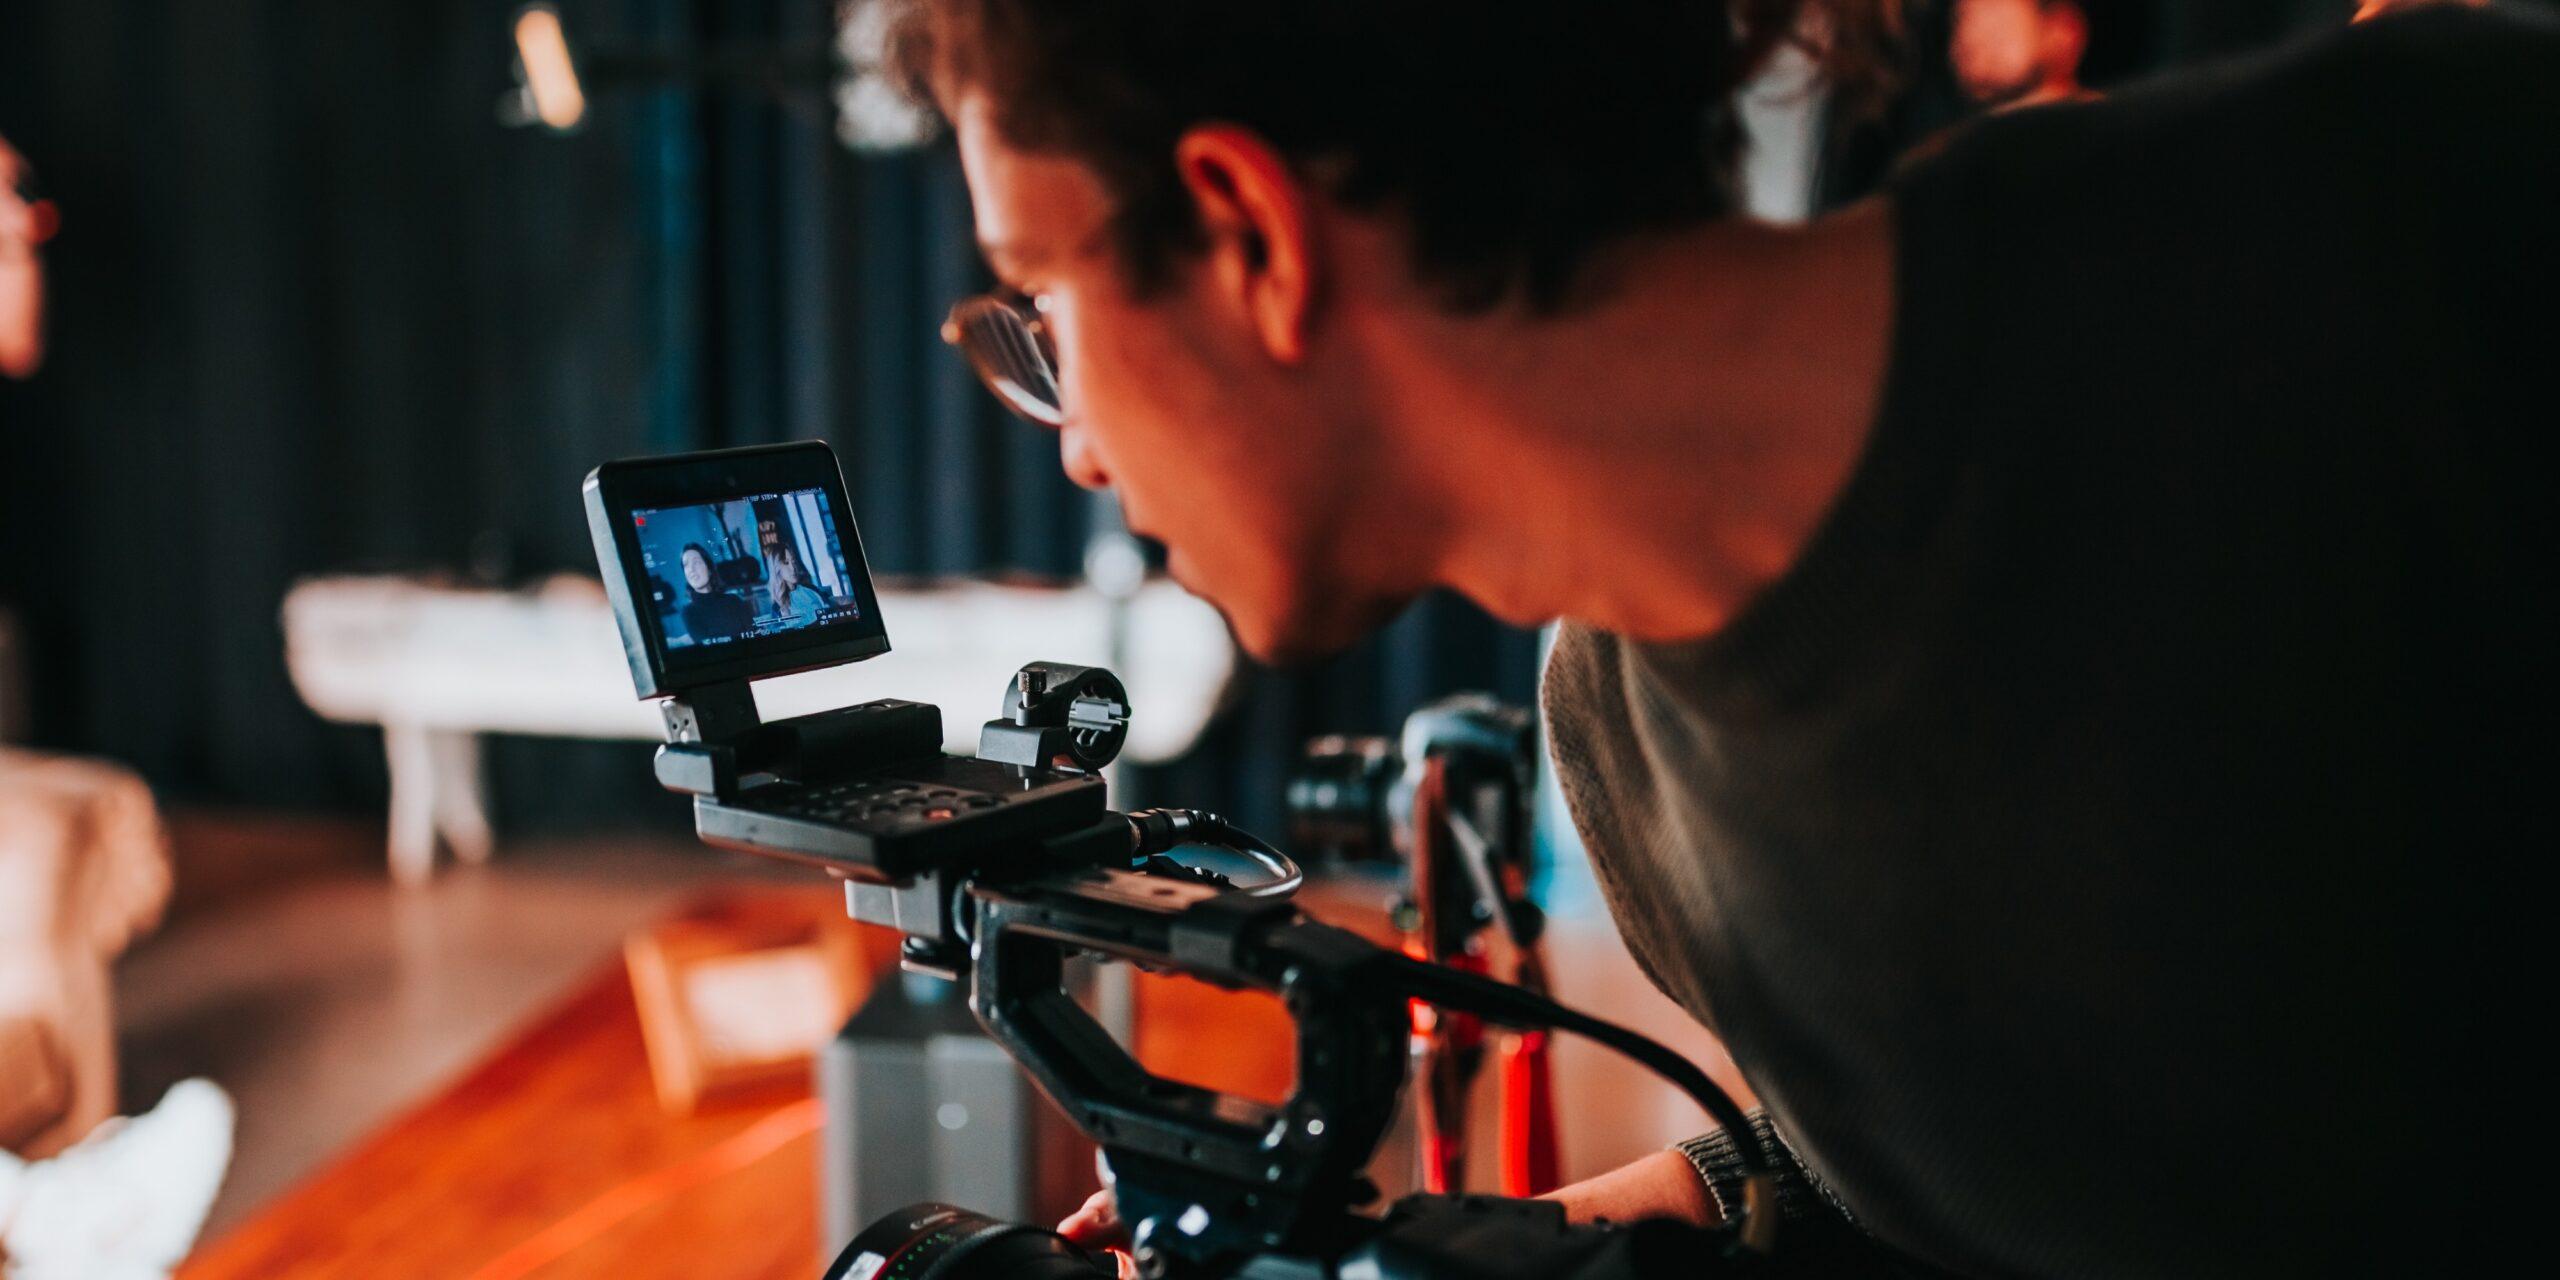 Professional Video Production | Media Training Courses | Flasheforward Films